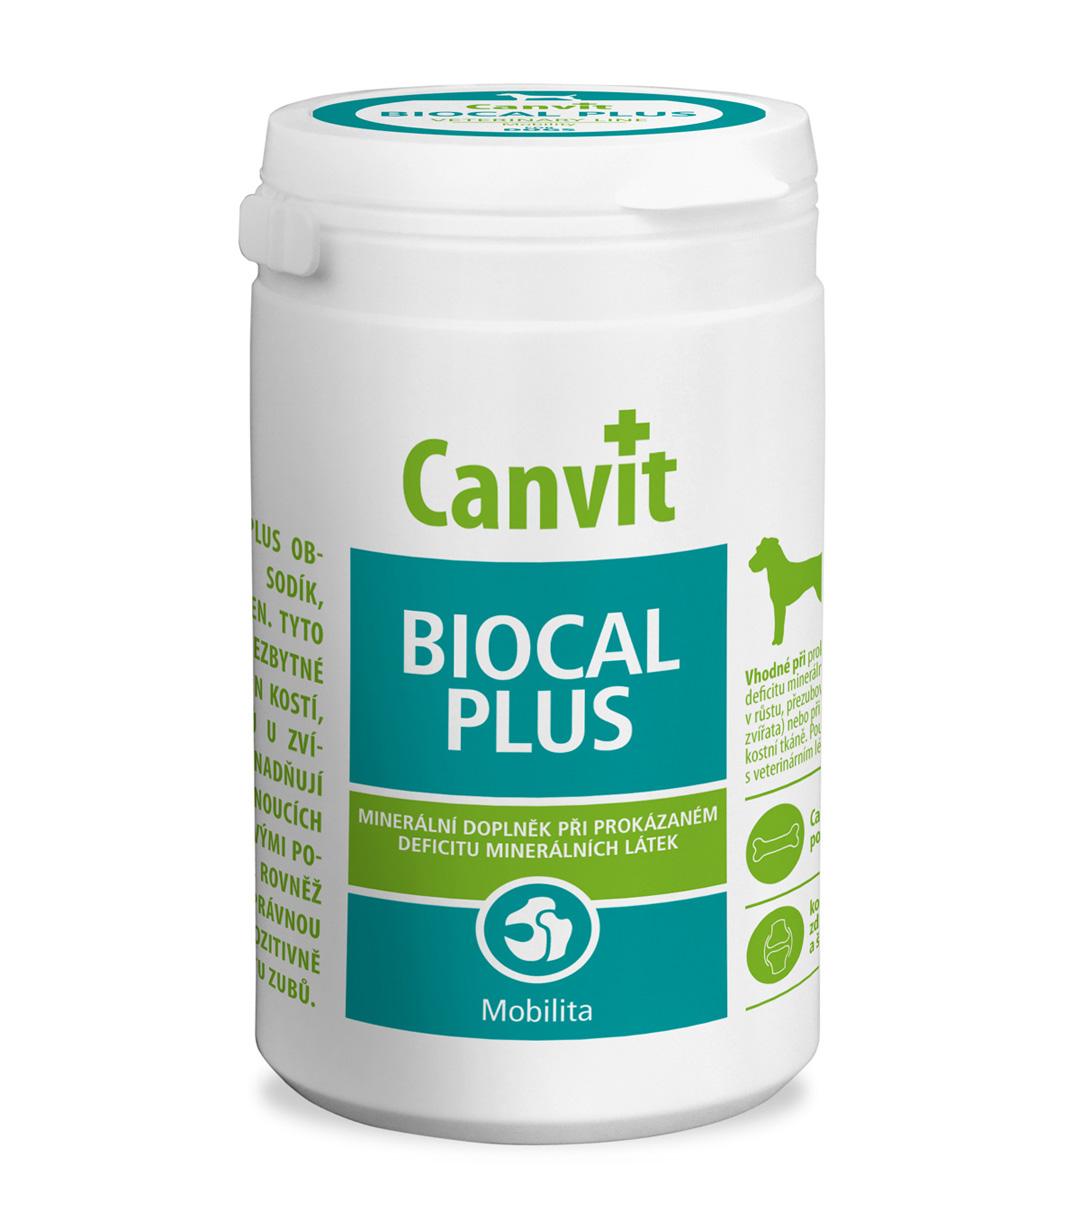 Canvit Biocal Plus pro psy 1000g